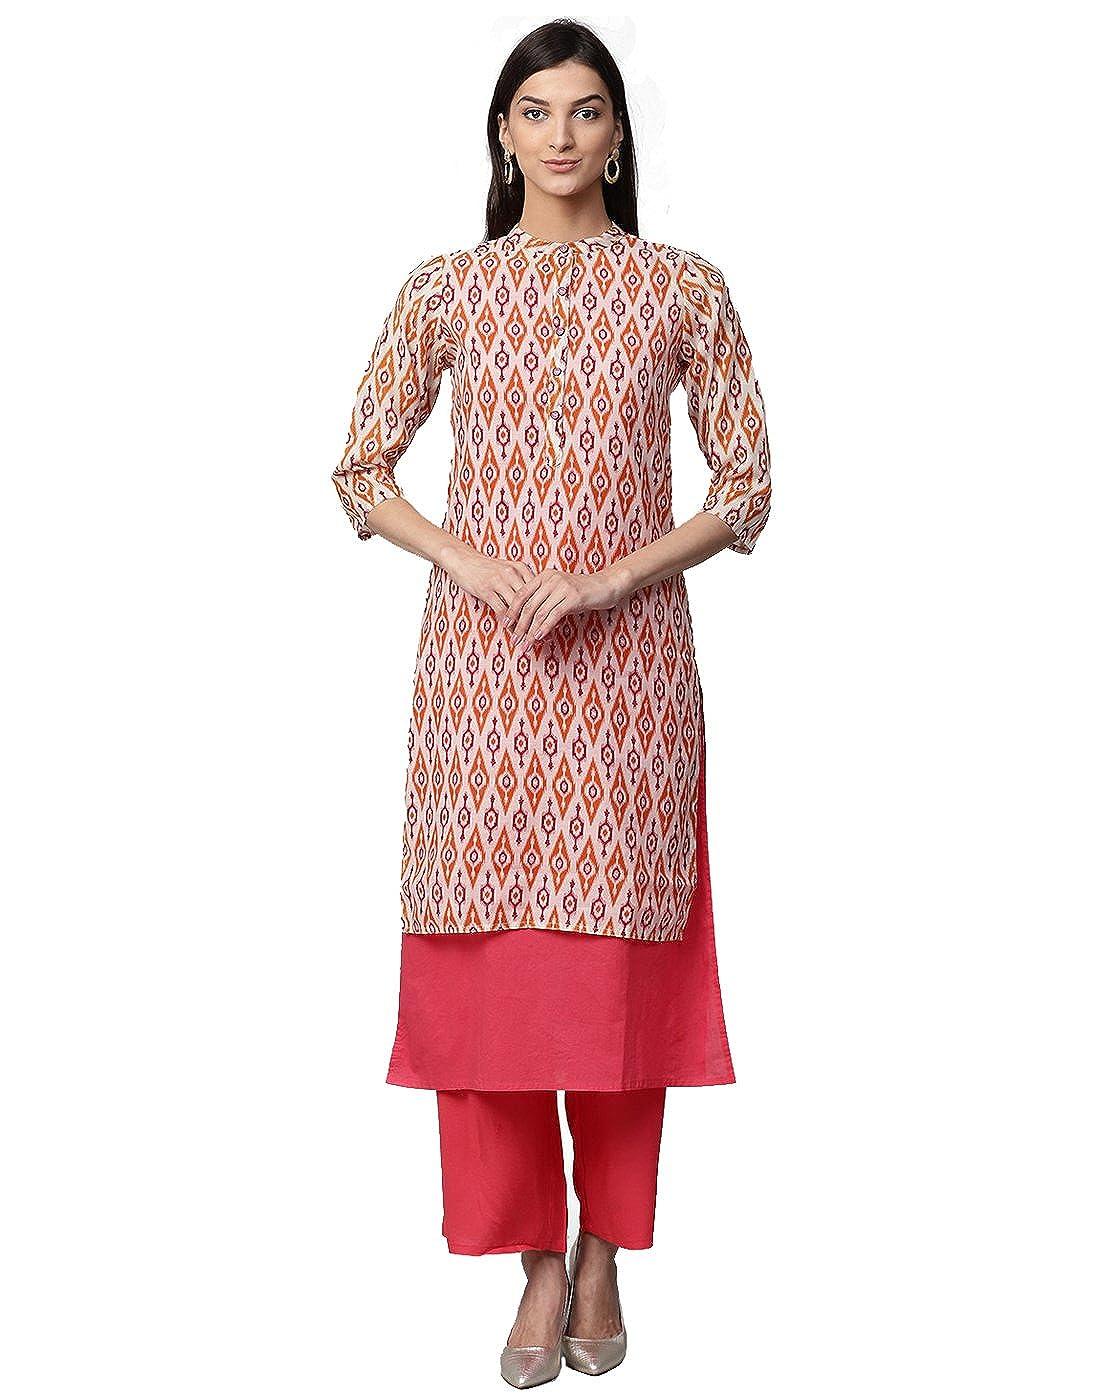 Jaipur Kurti Women Ethnic Casual Tunic Top Summer Dress Ikat Print Layered Chanderi & Cotton Kurta & Palazzos (Pink)